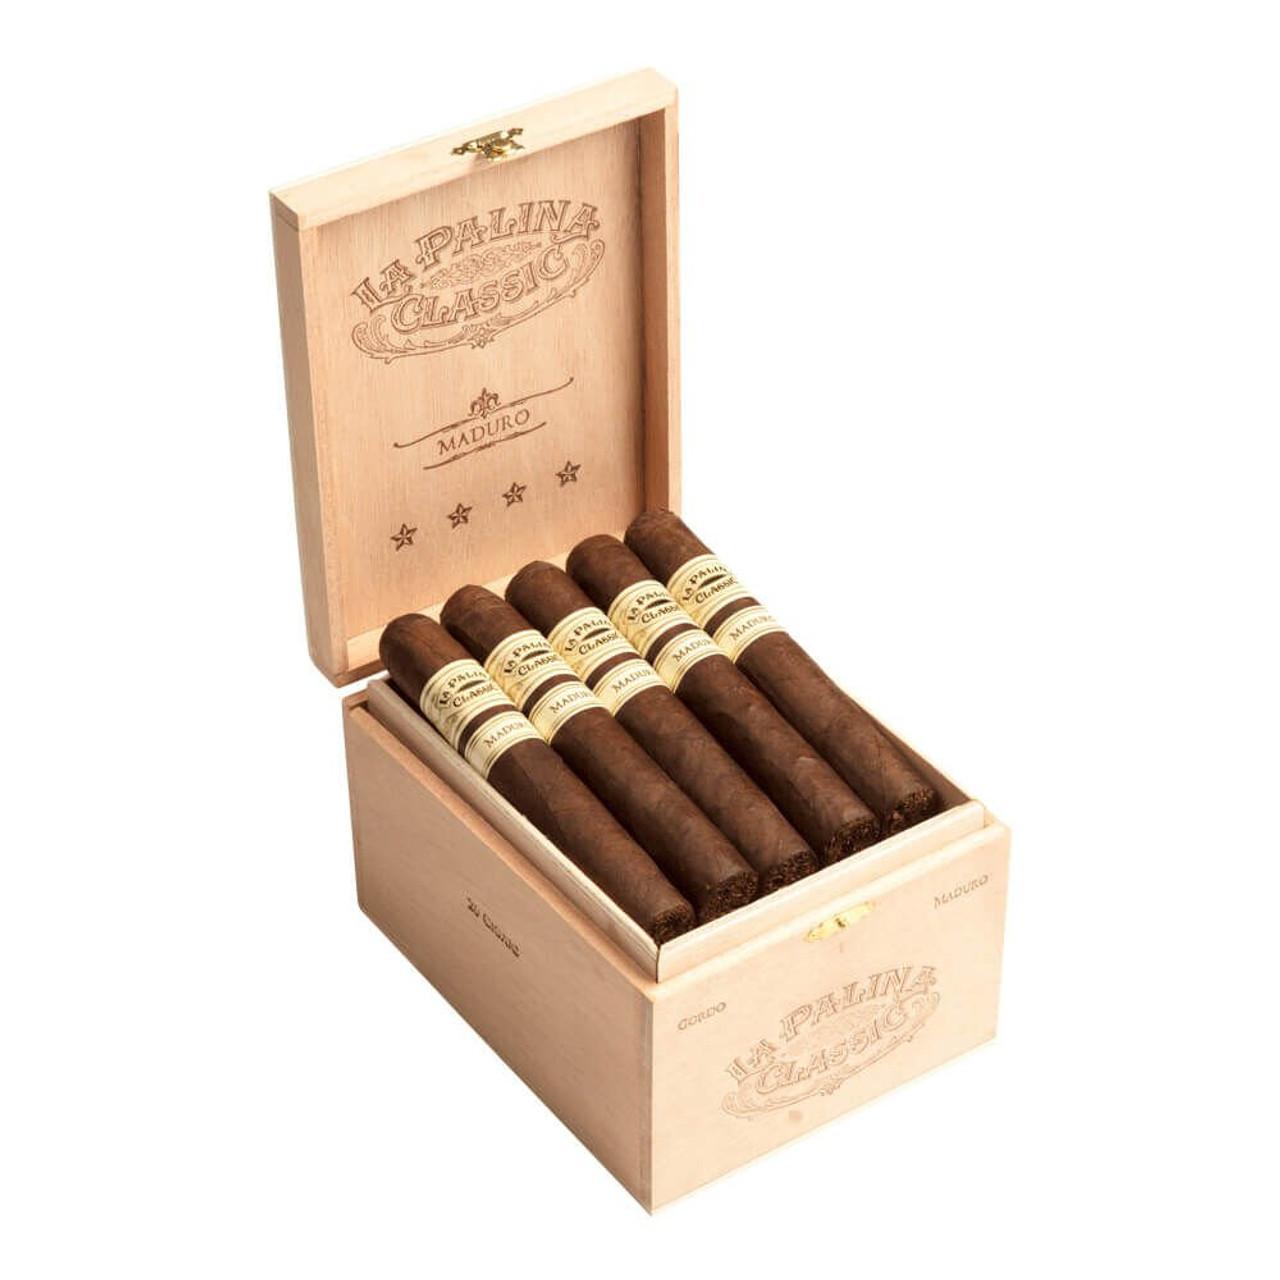 La Palina Classic Maduro Toro Cigars - 6.25 x 50 (Box of 20)